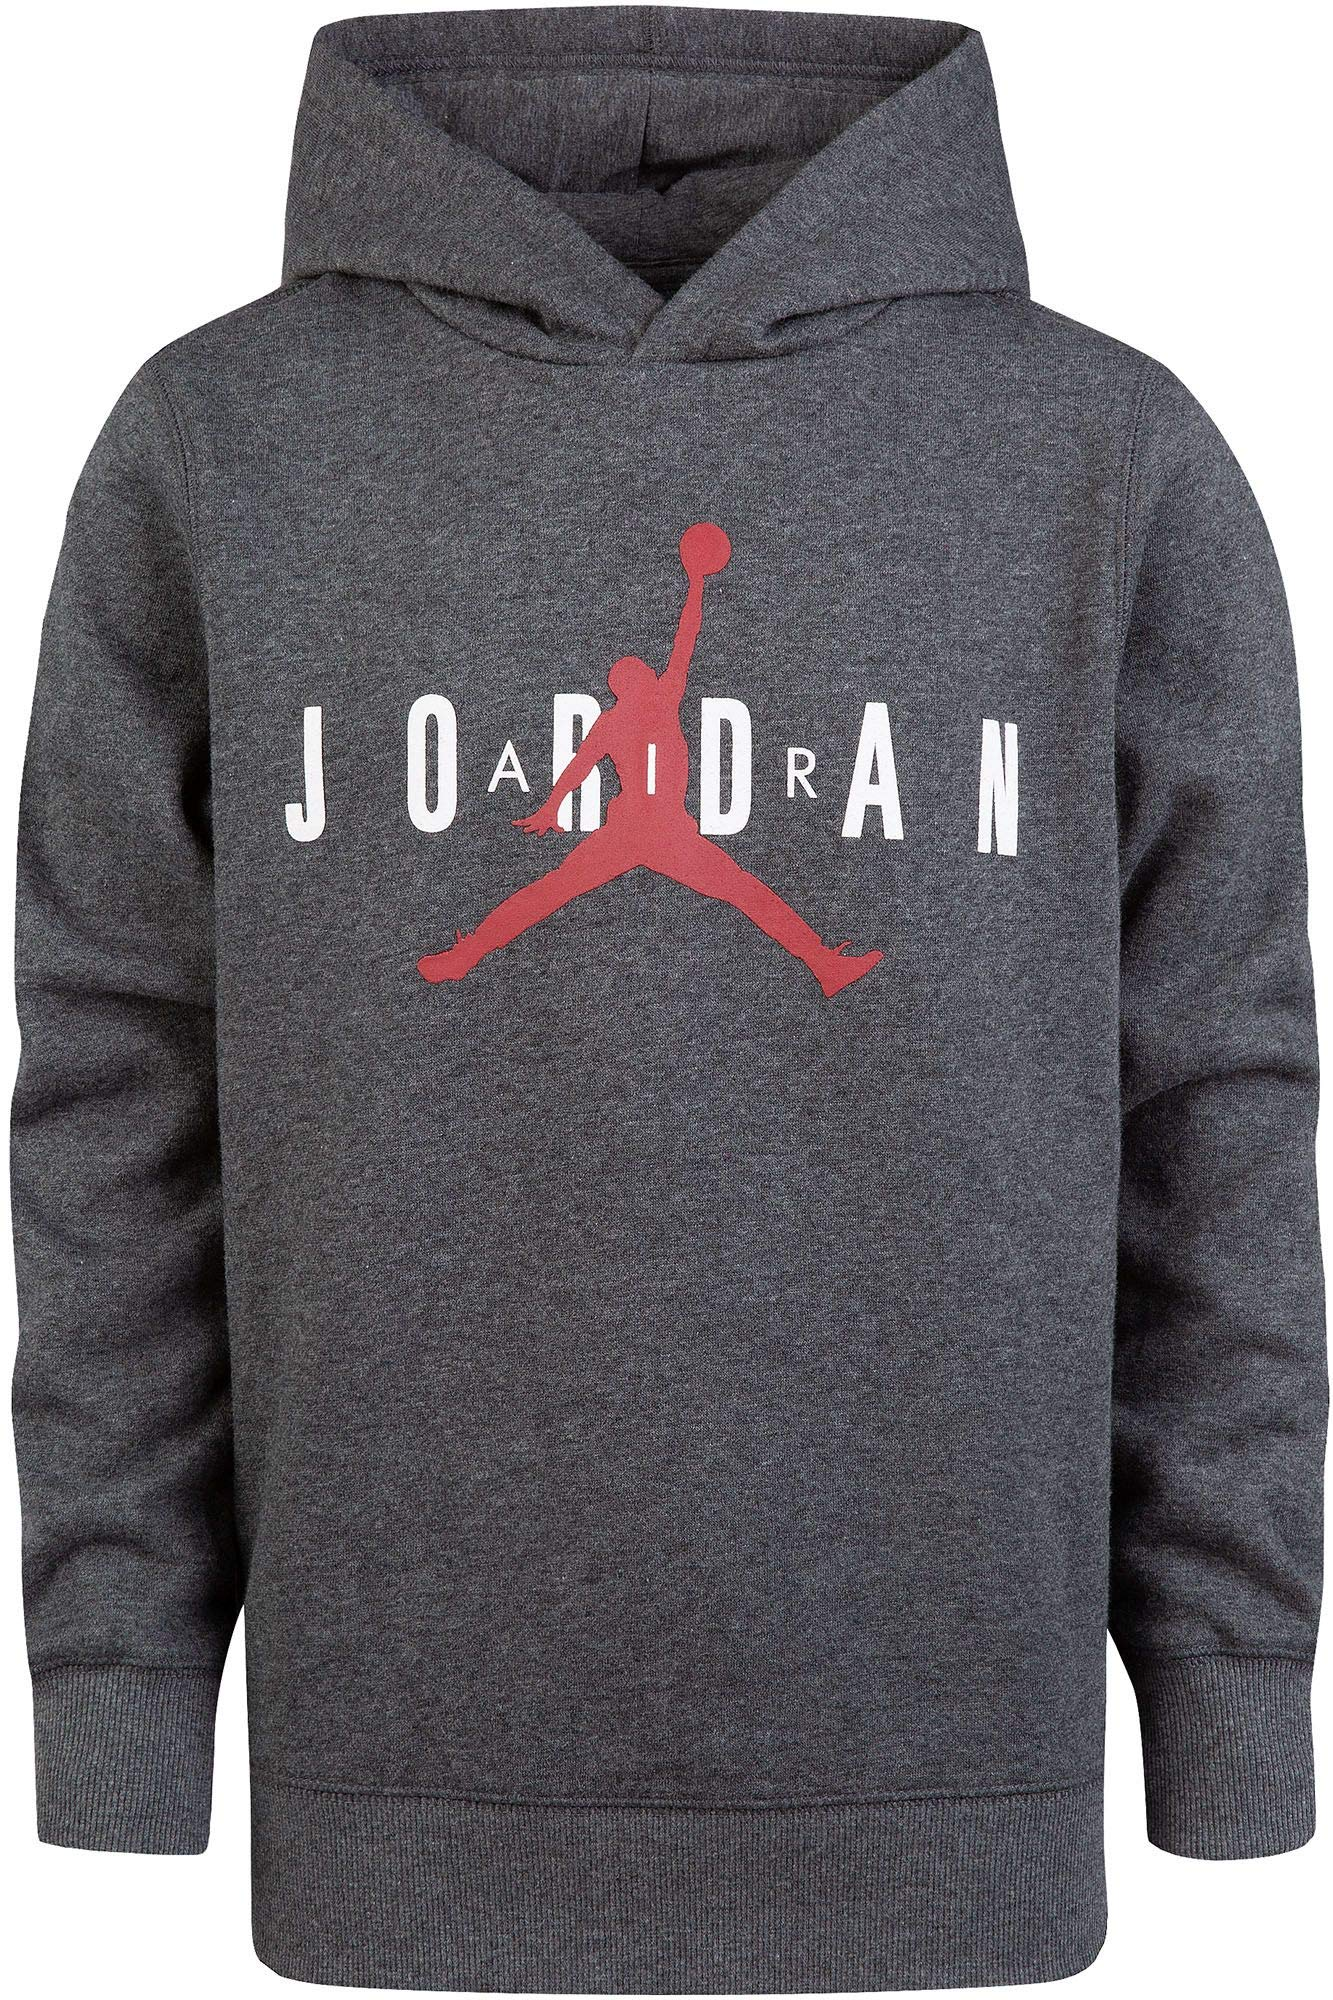 Jordan Boy's Air Fleece Hoodie (M, Charcoal Heather)